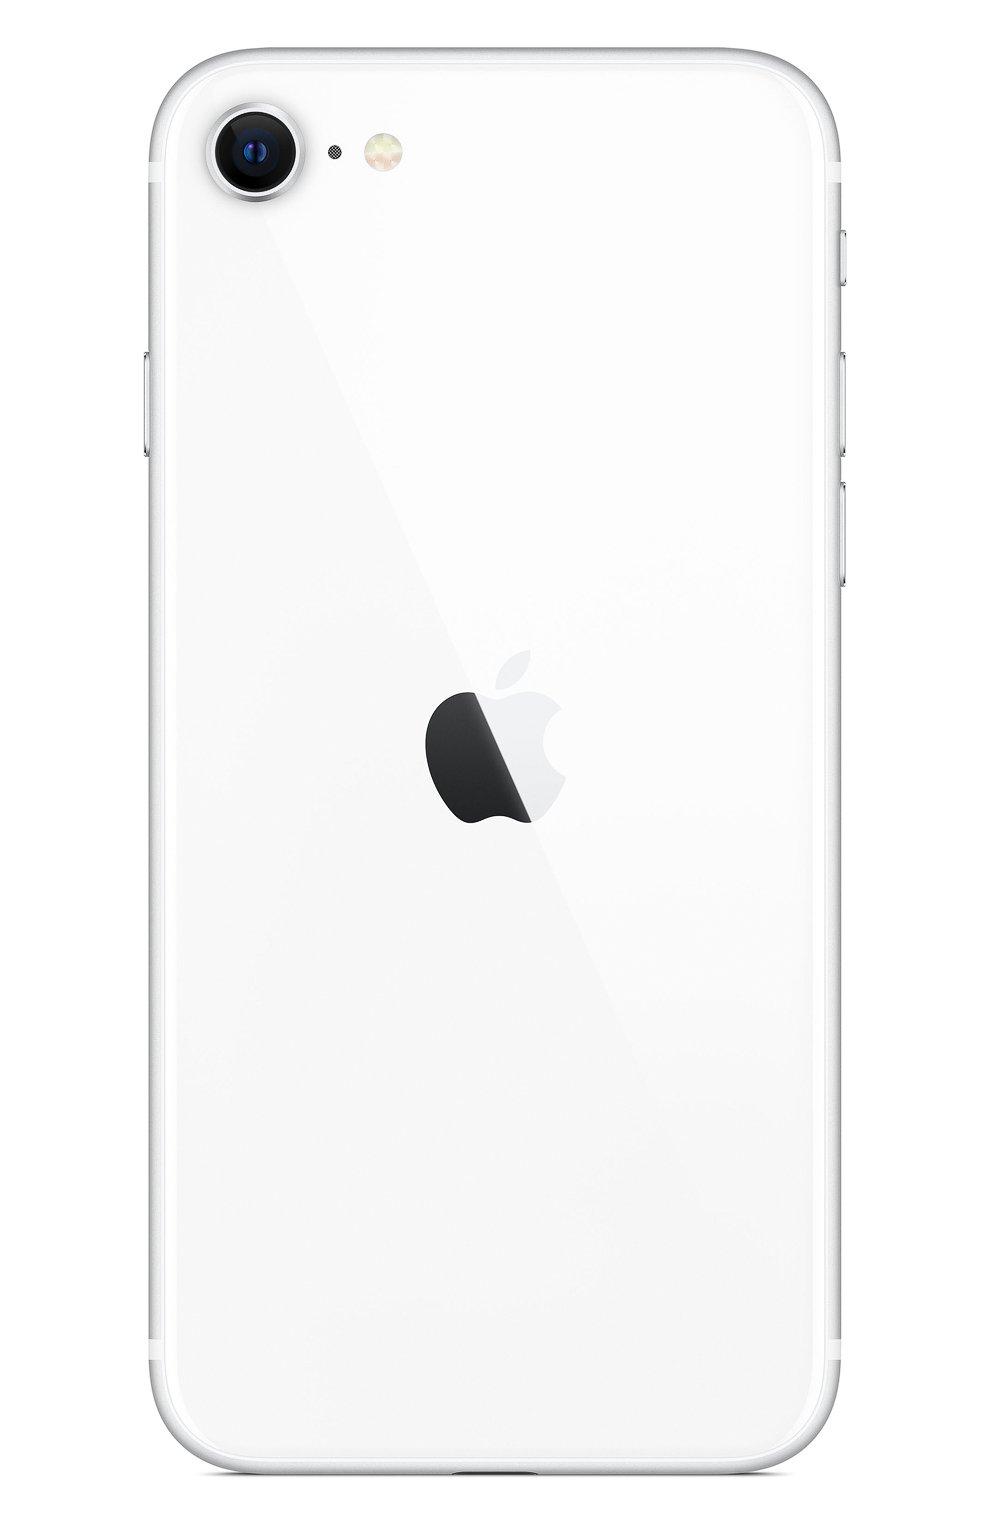 Мужской iphone se (2020) 128gb white APPLE  white цвета, арт. MXD12RU/A | Фото 2